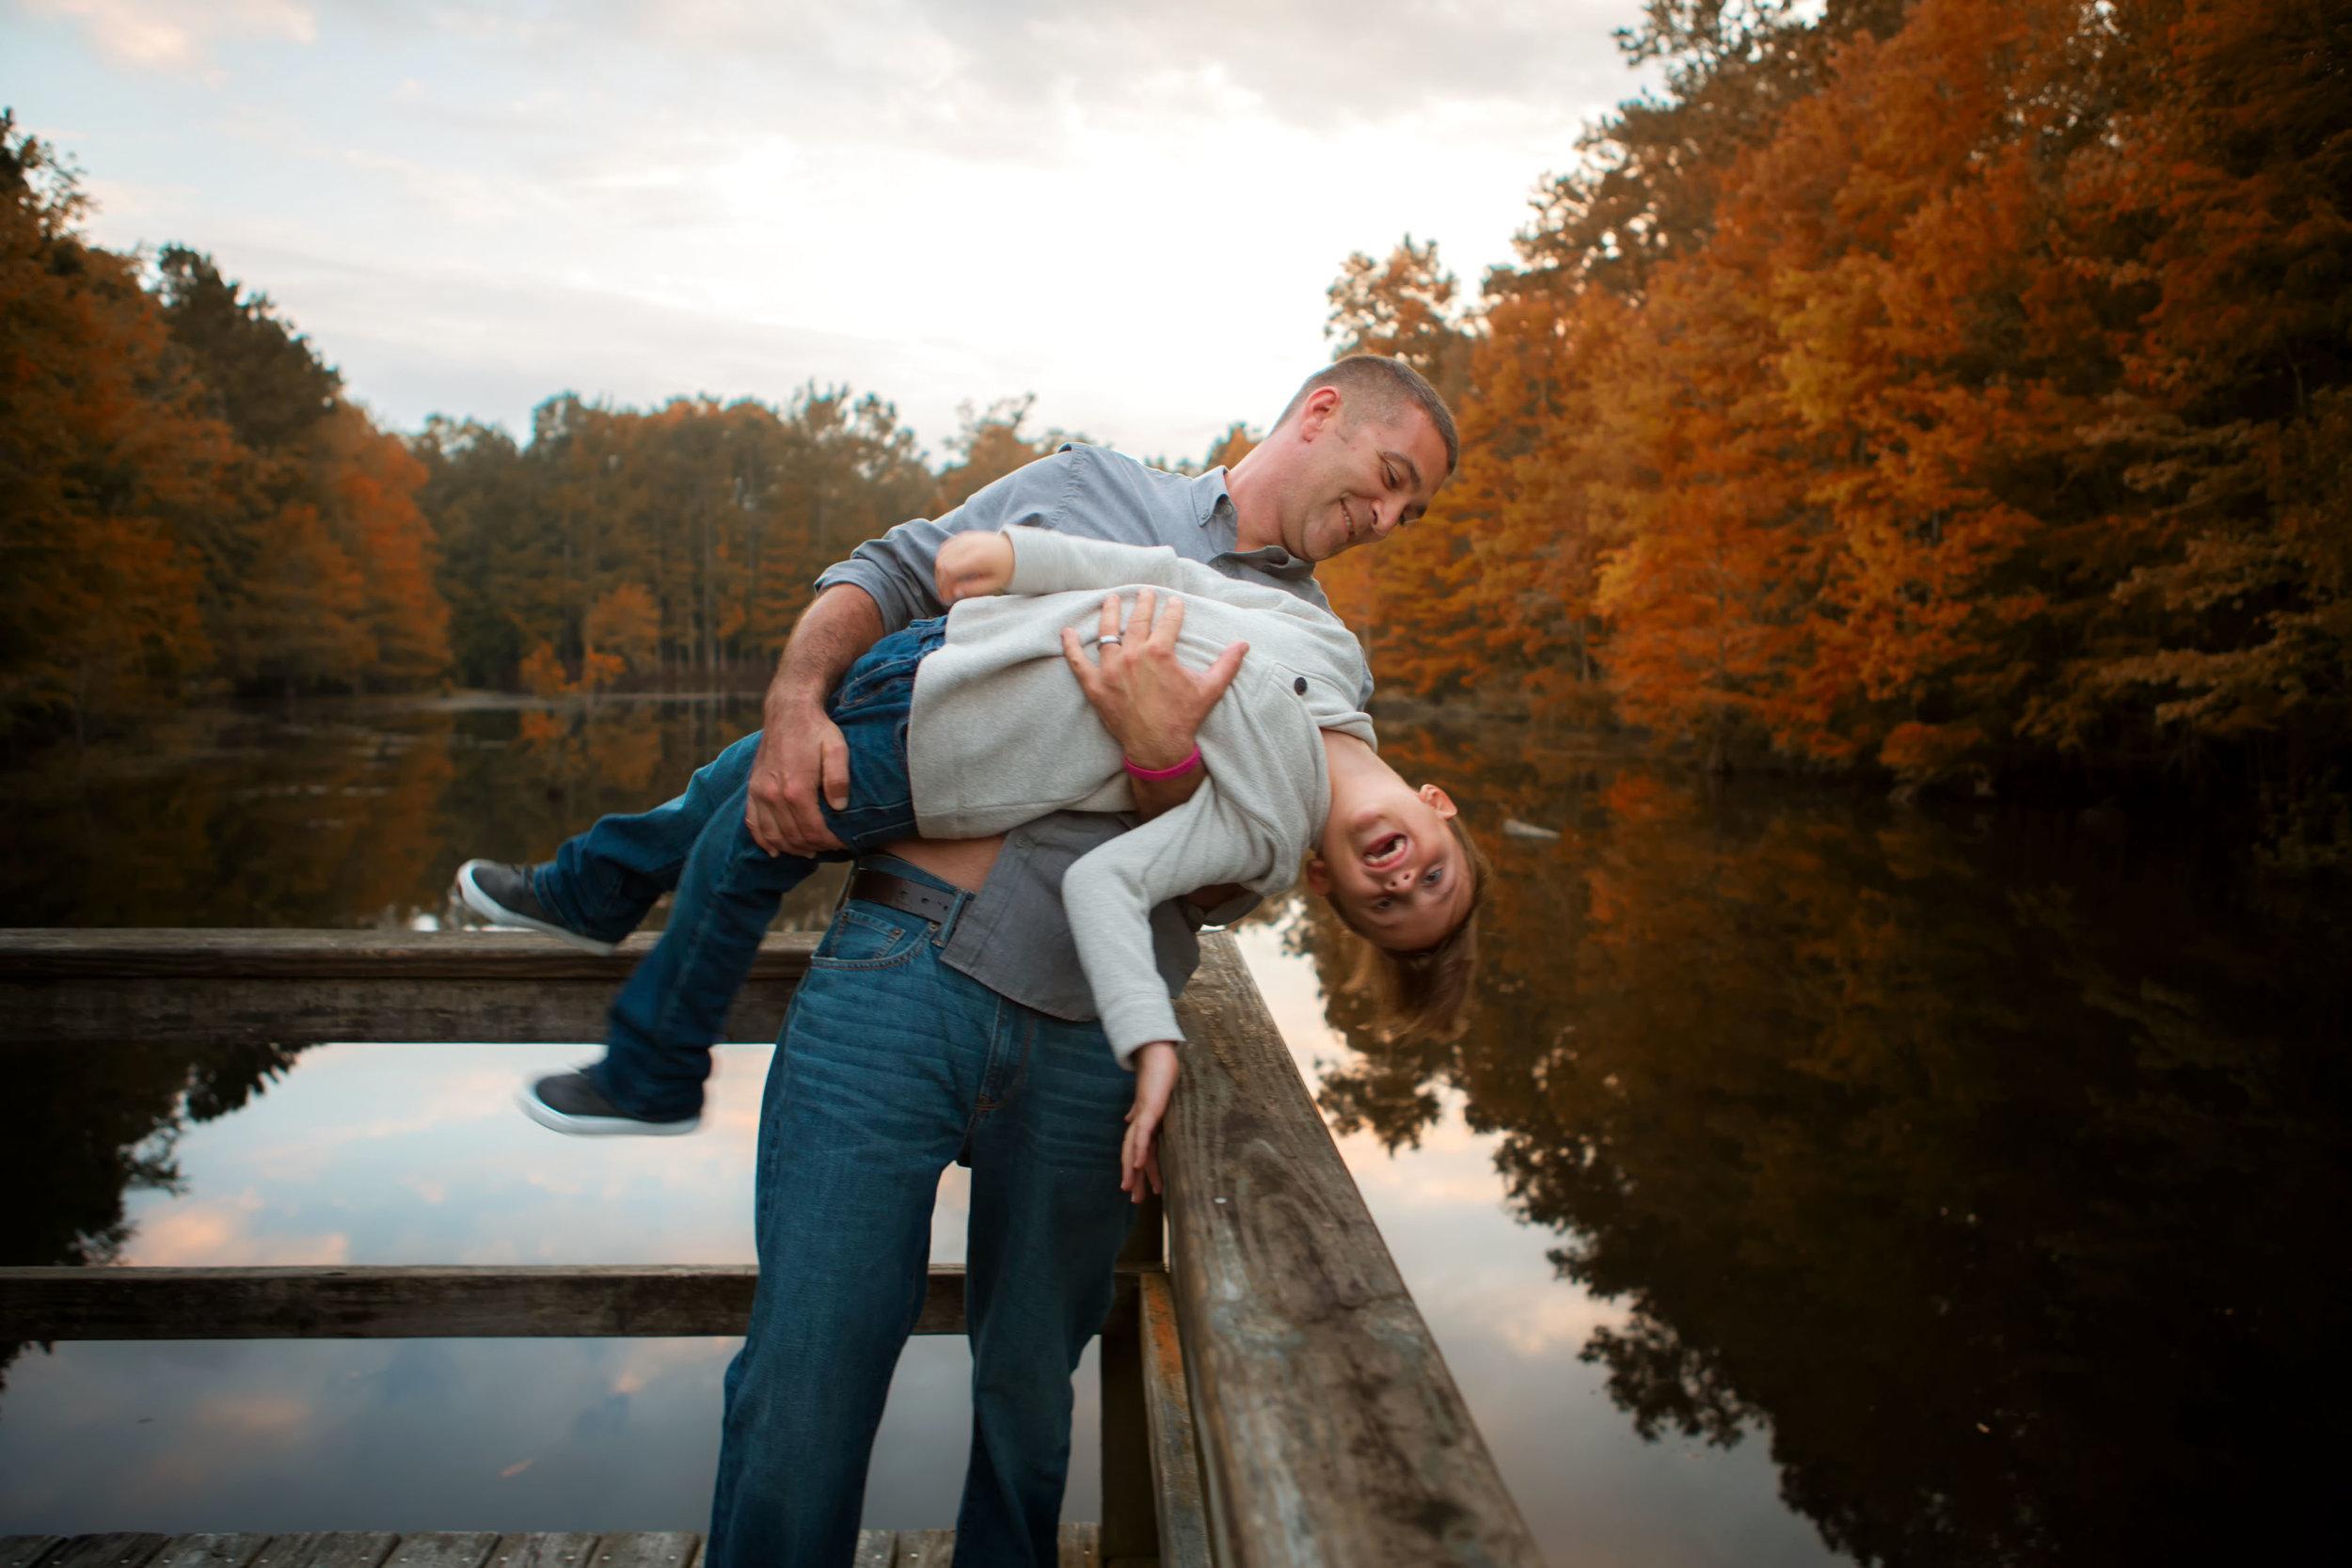 Fall-Woods-Mini-Session-Wilmington-NC-Tiffany-Abruzzo-Photography-19.jpg